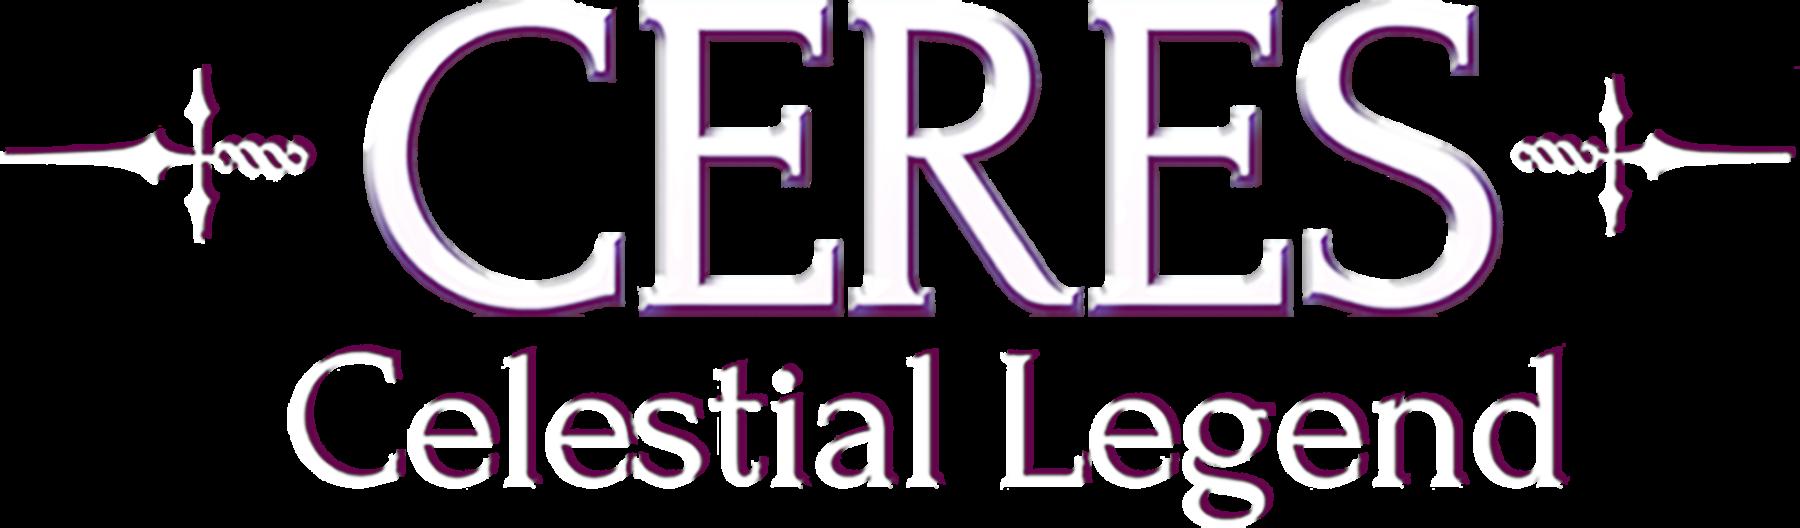 Ceres: Celestial Legend